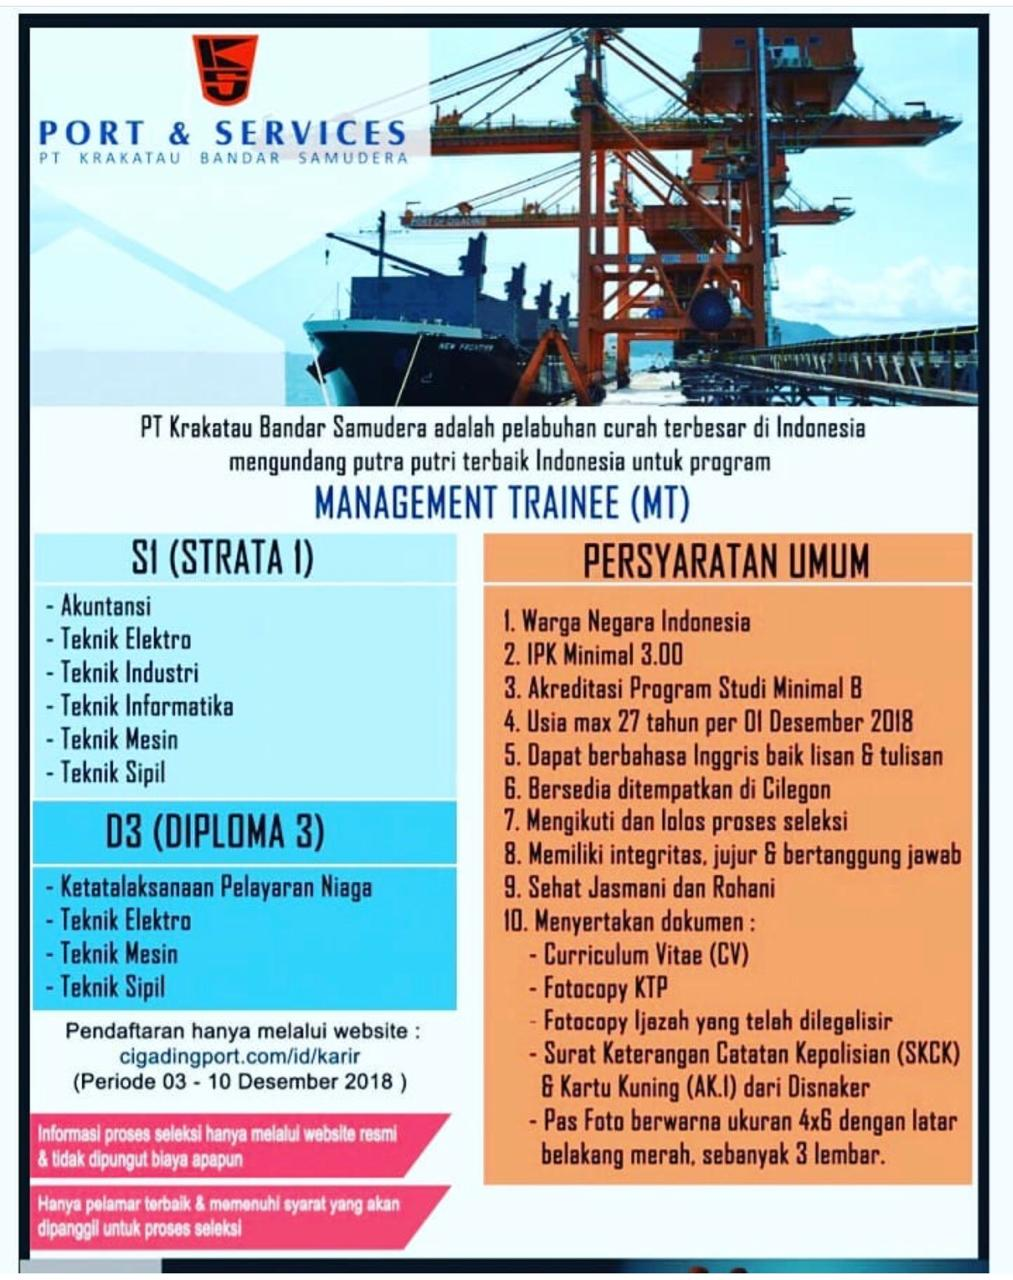 Lowongan Management Trainee PT. Krakatau Bandar Samudera